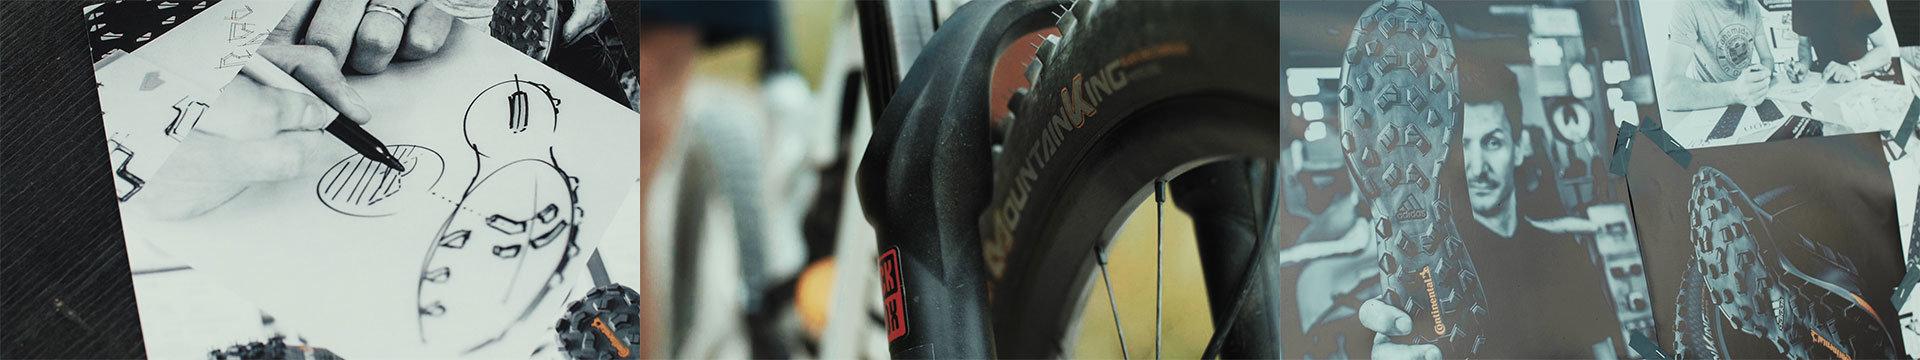 werbeagentur heidelberg - continental adidas terrex video snippets 2